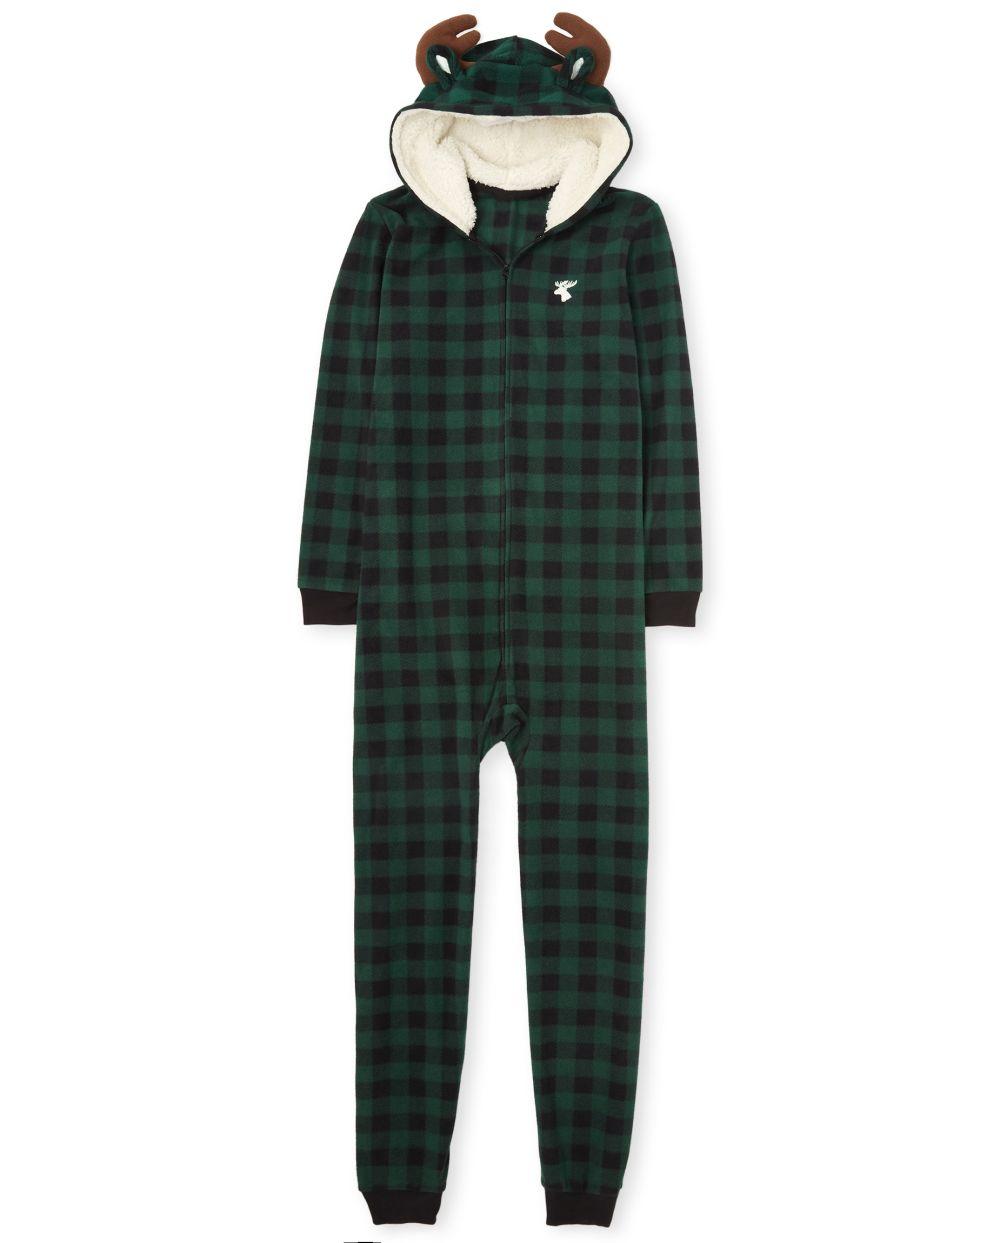 Unisex Adult Matching Family Moose Buffalo Plaid Fleece One Piece Pajamas